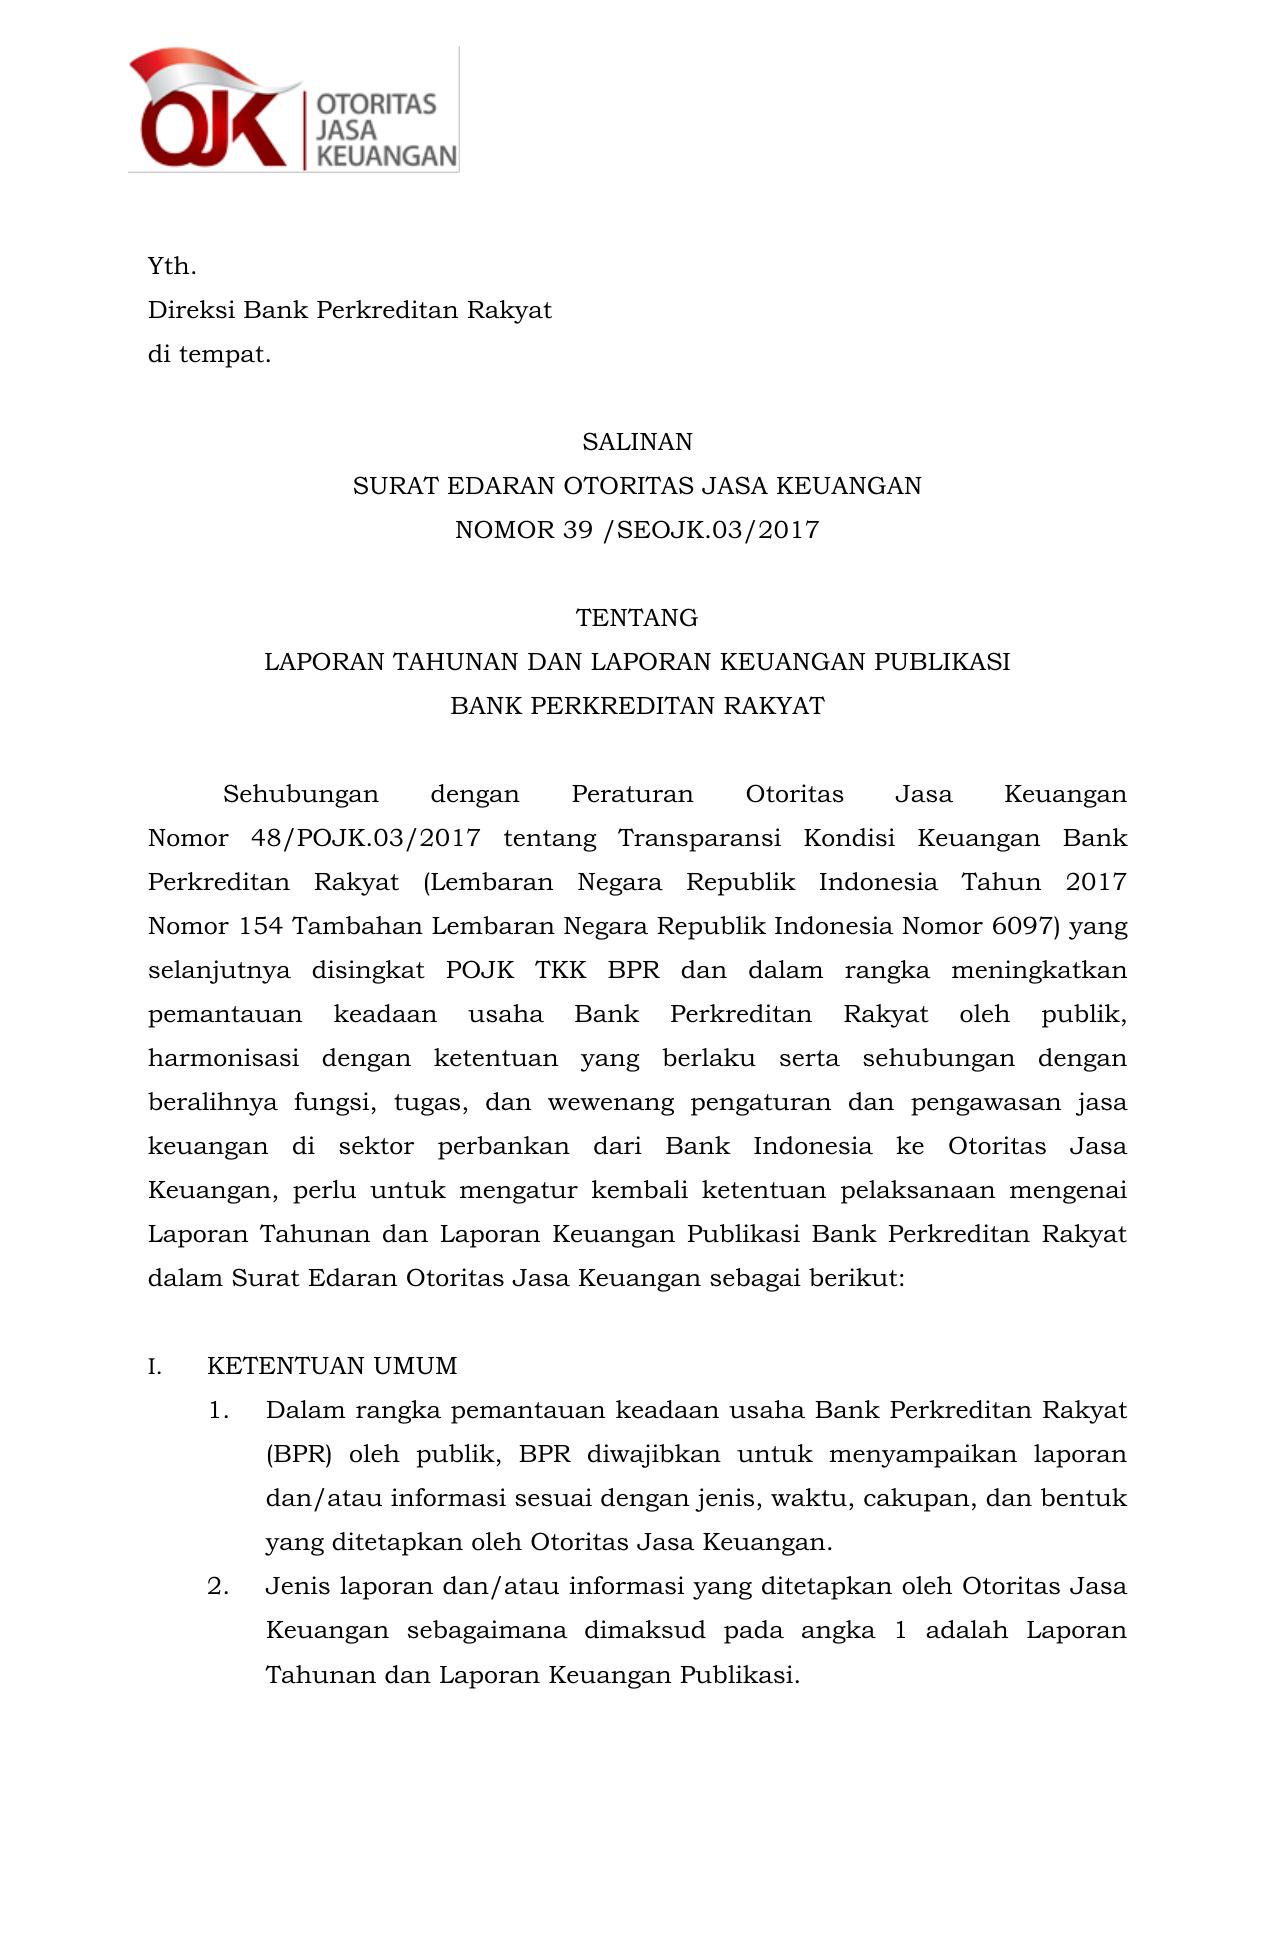 Yth Direksi Bank Perkreditan Rakyat Di Tempat Salinan Surat